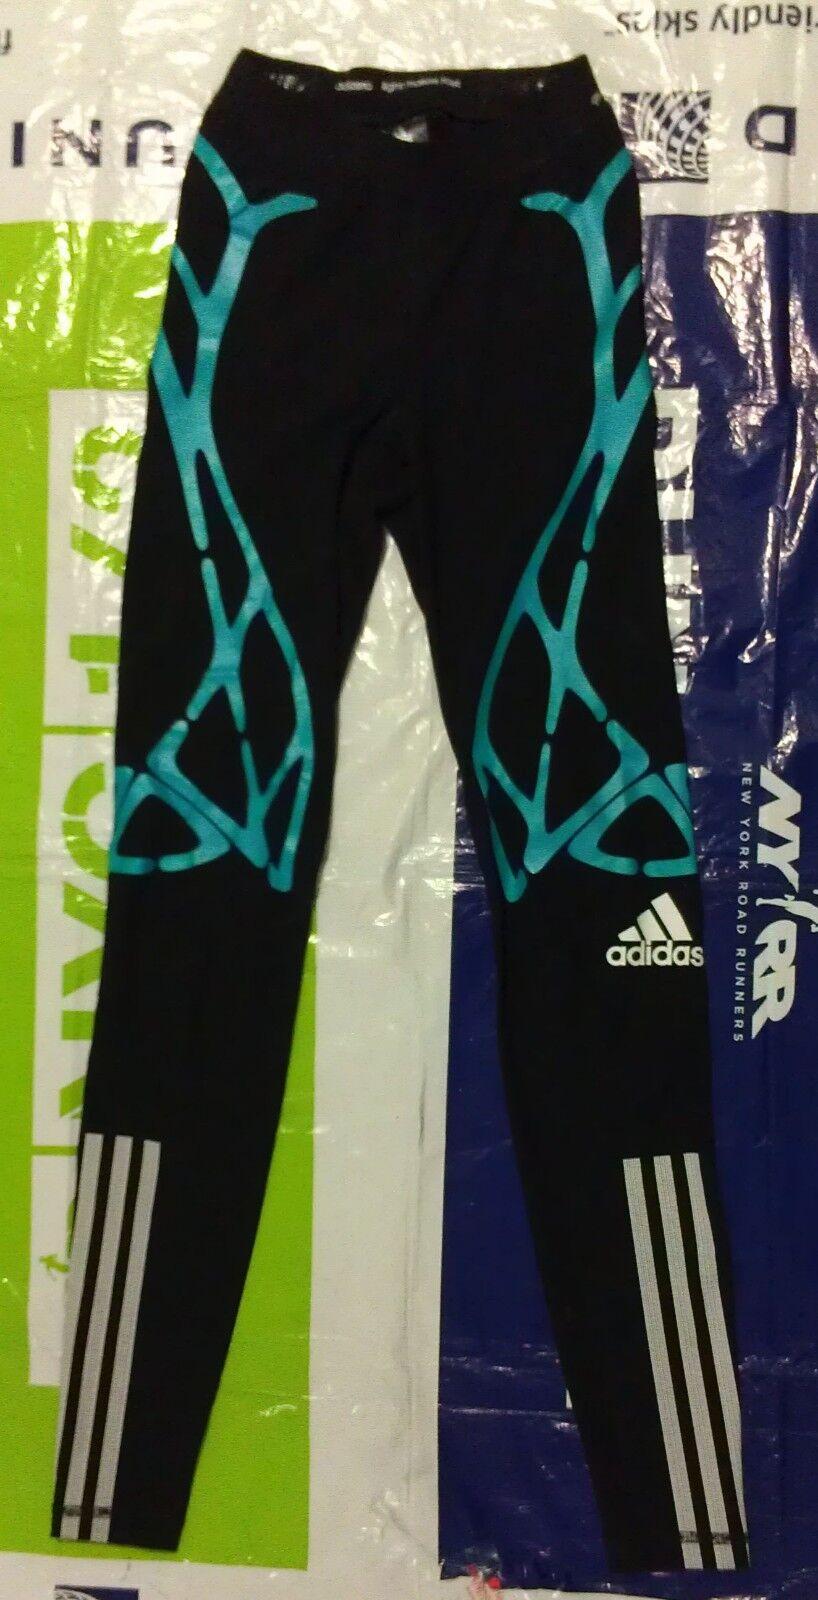 BNWT collants longs adidas adizero techfit sprint web pour hommes XS AJ4965